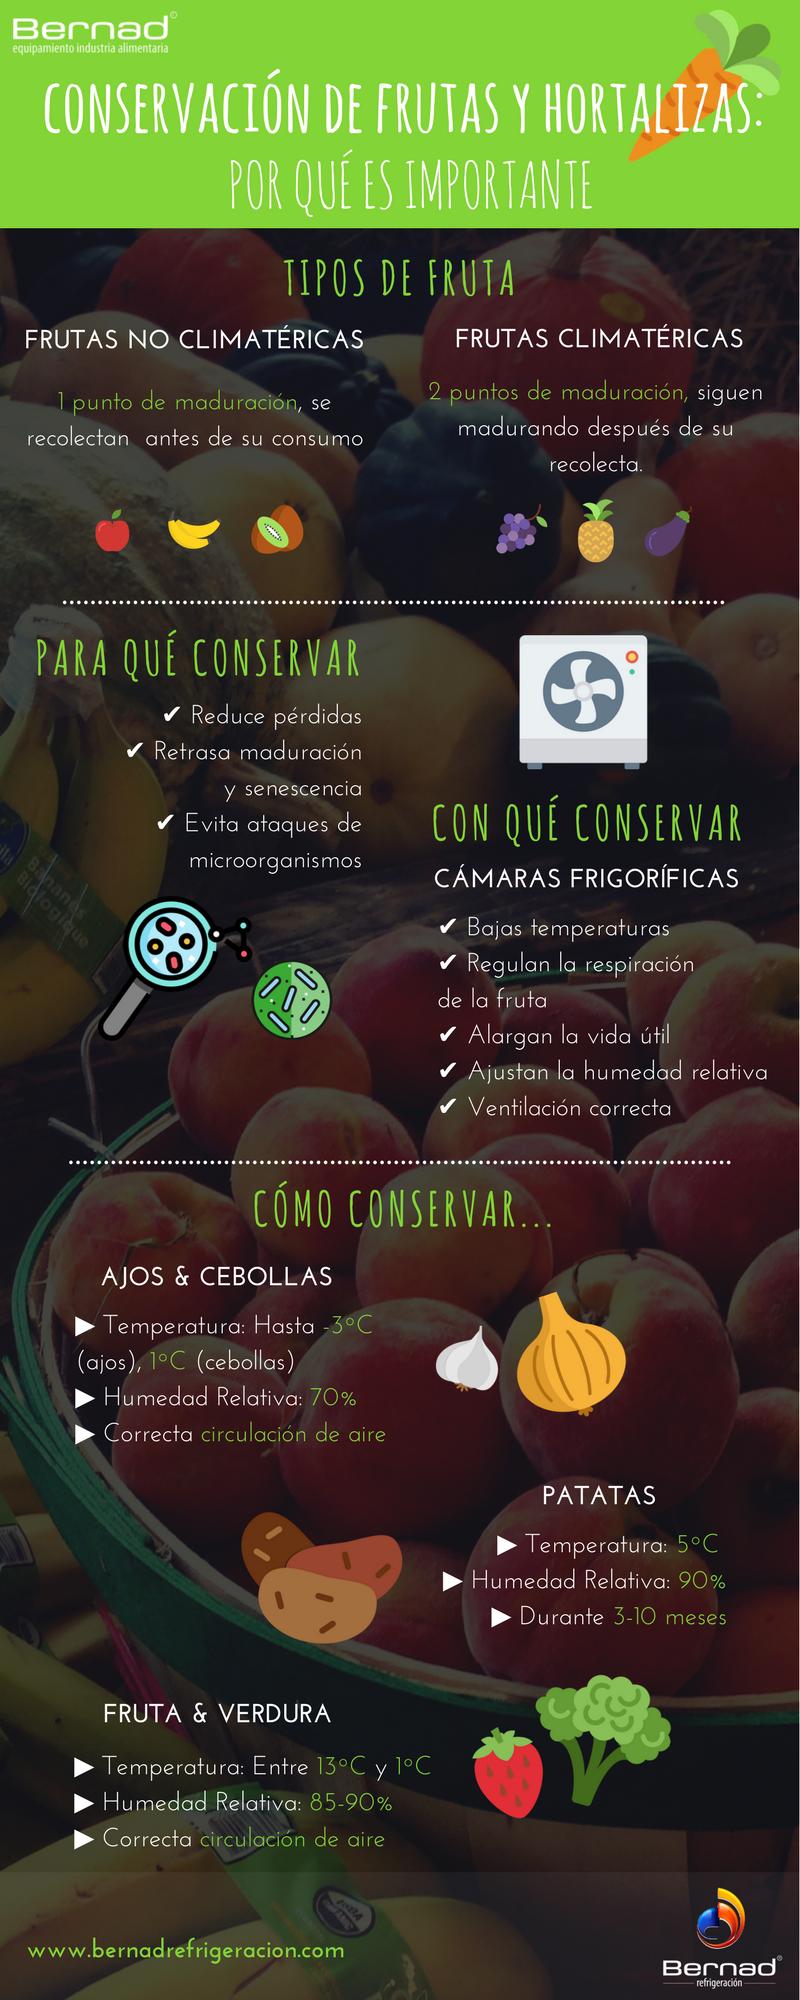 conservacion fruta